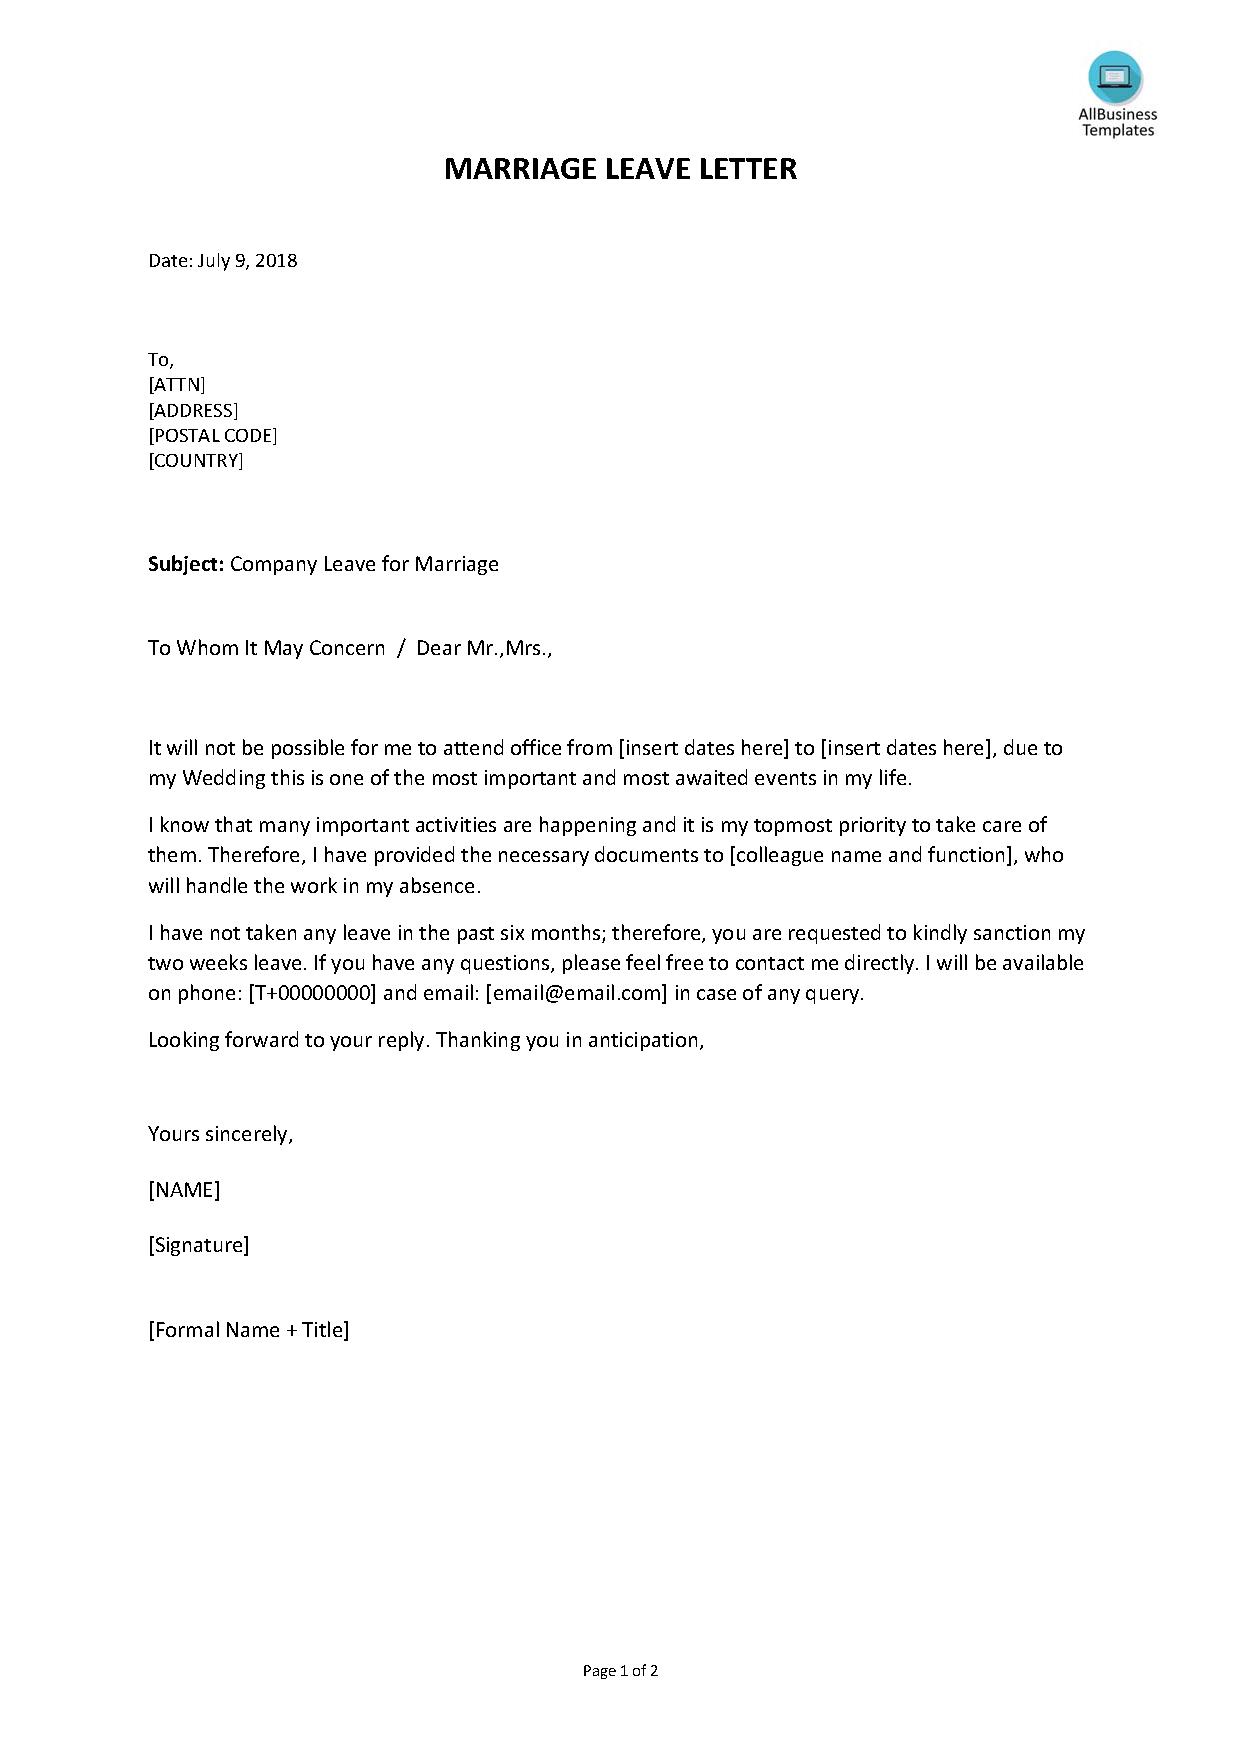 25+ leave letter templates pdf, doc | free & premium templates.